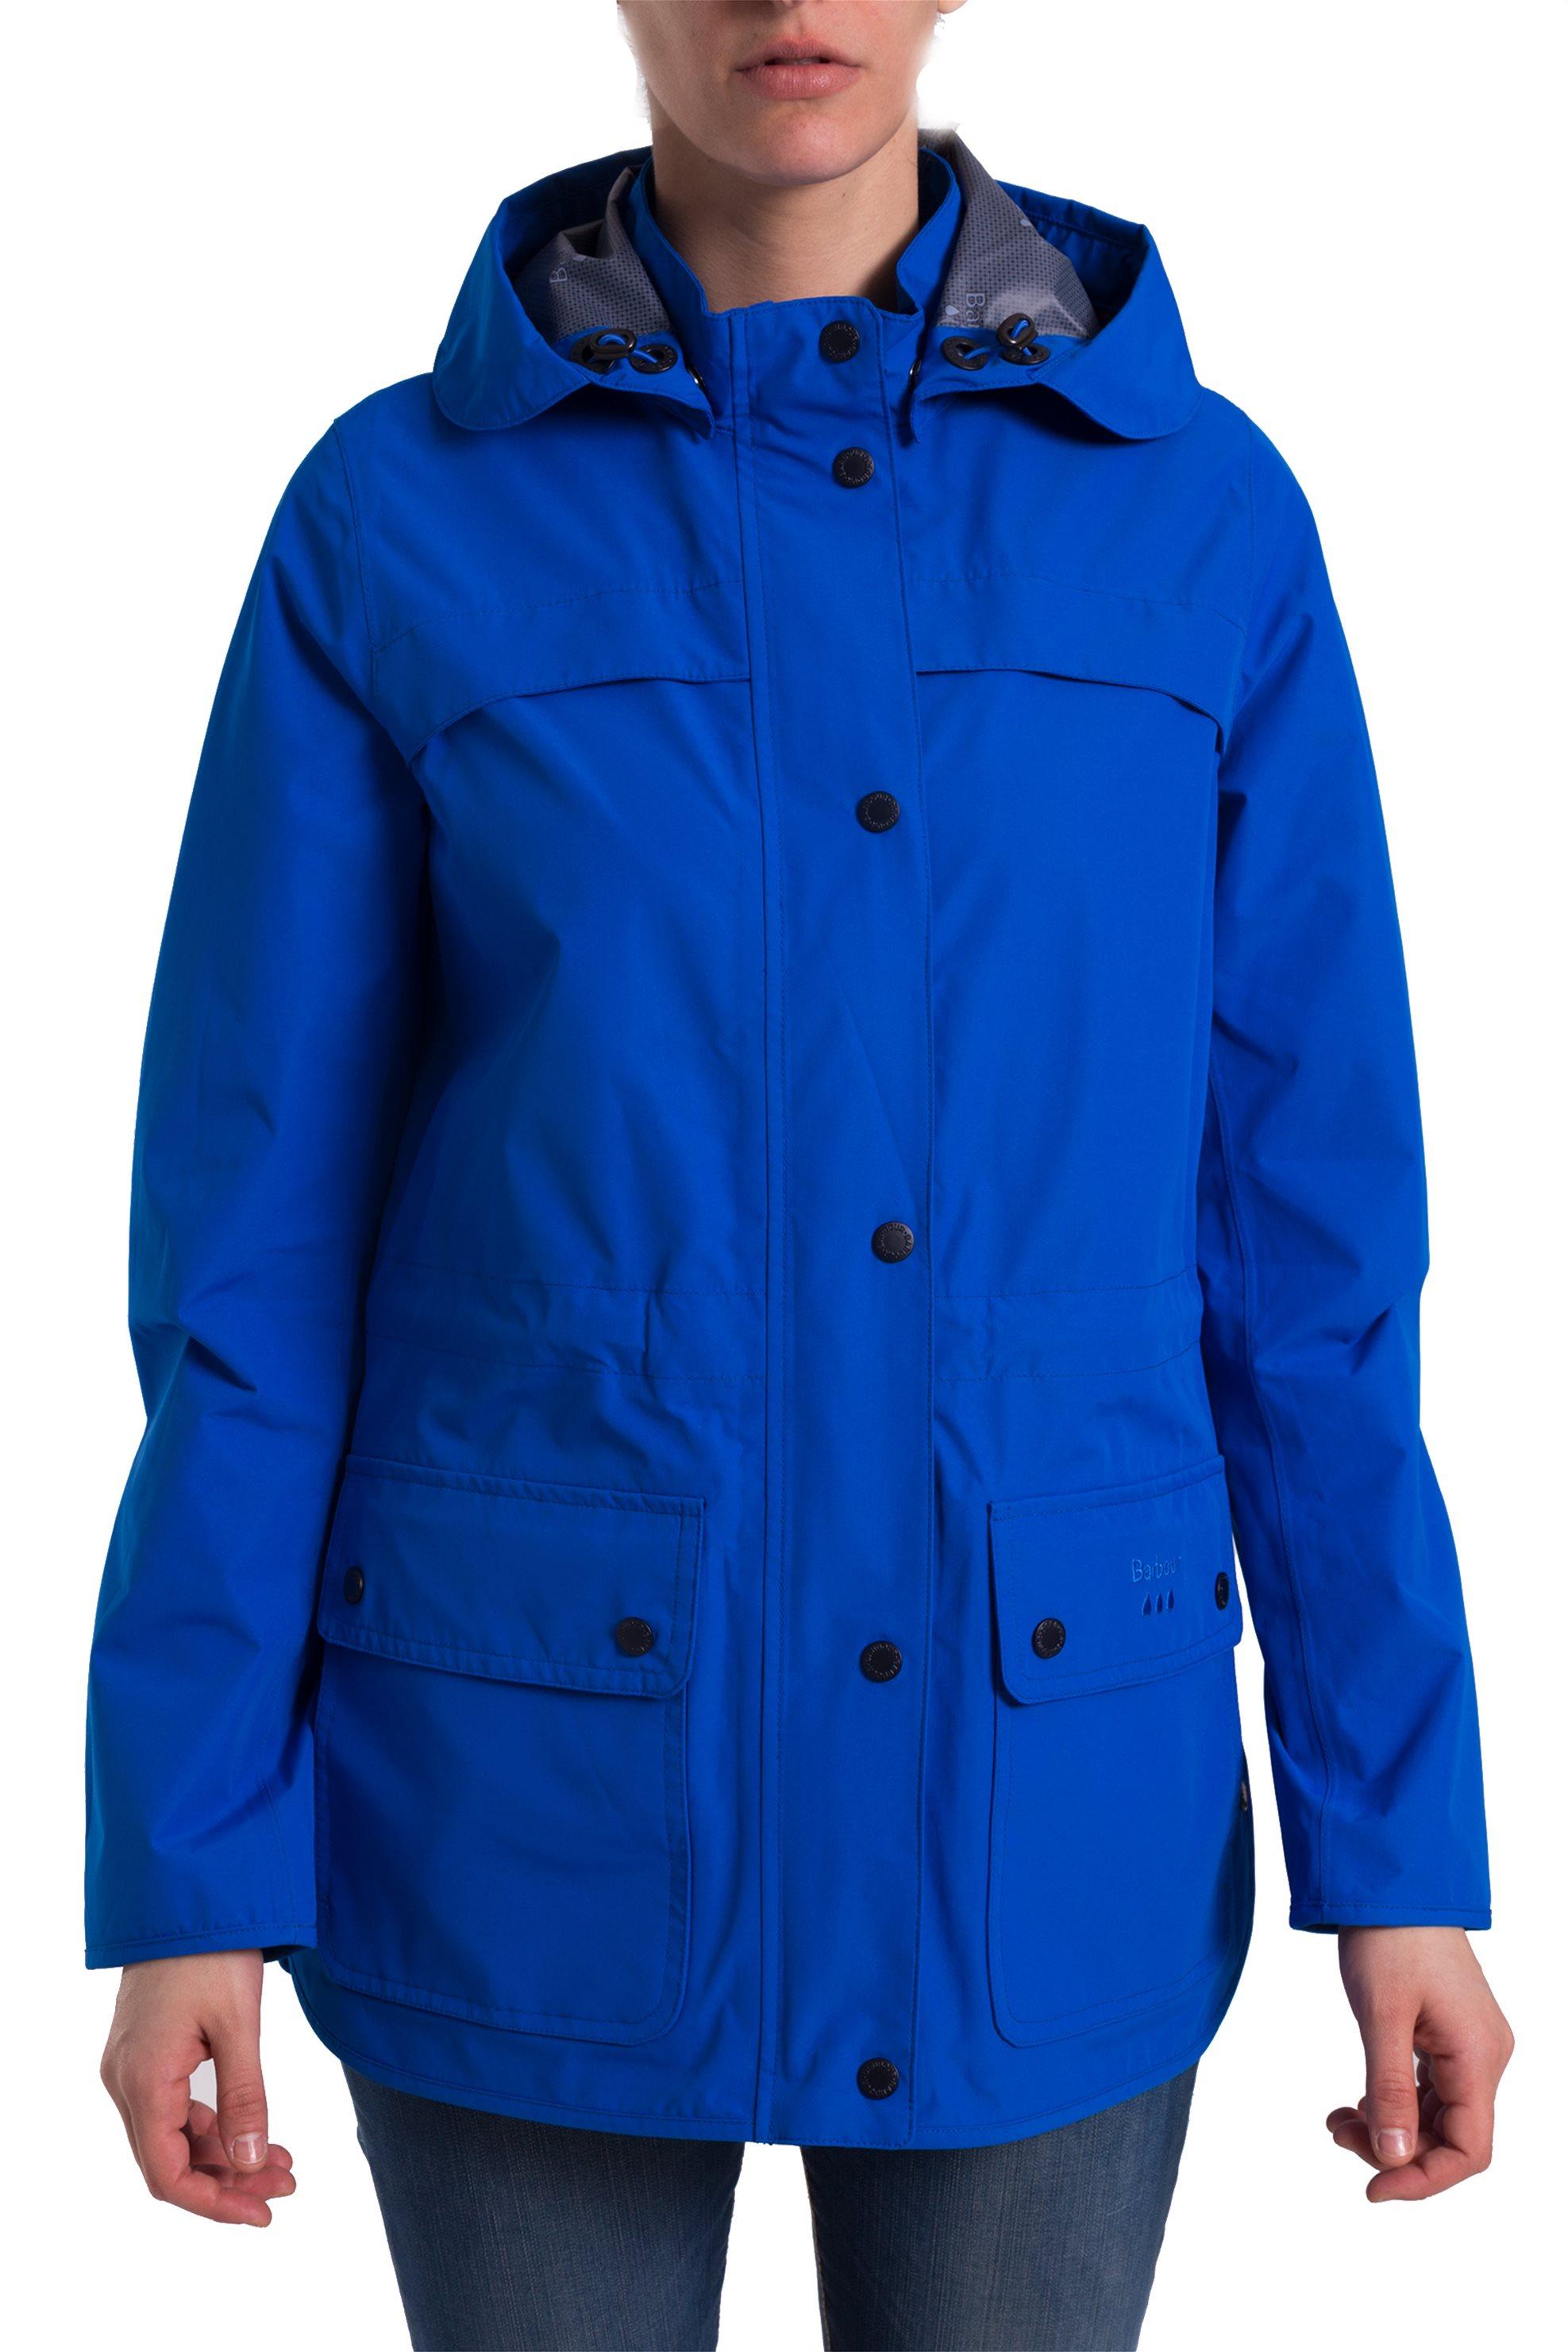 28adcbdc7b9 Γυναικείο αδιάβροχο μπουφάν με κουκούλα Barometer Barbour - LWB0460 - Μπλε